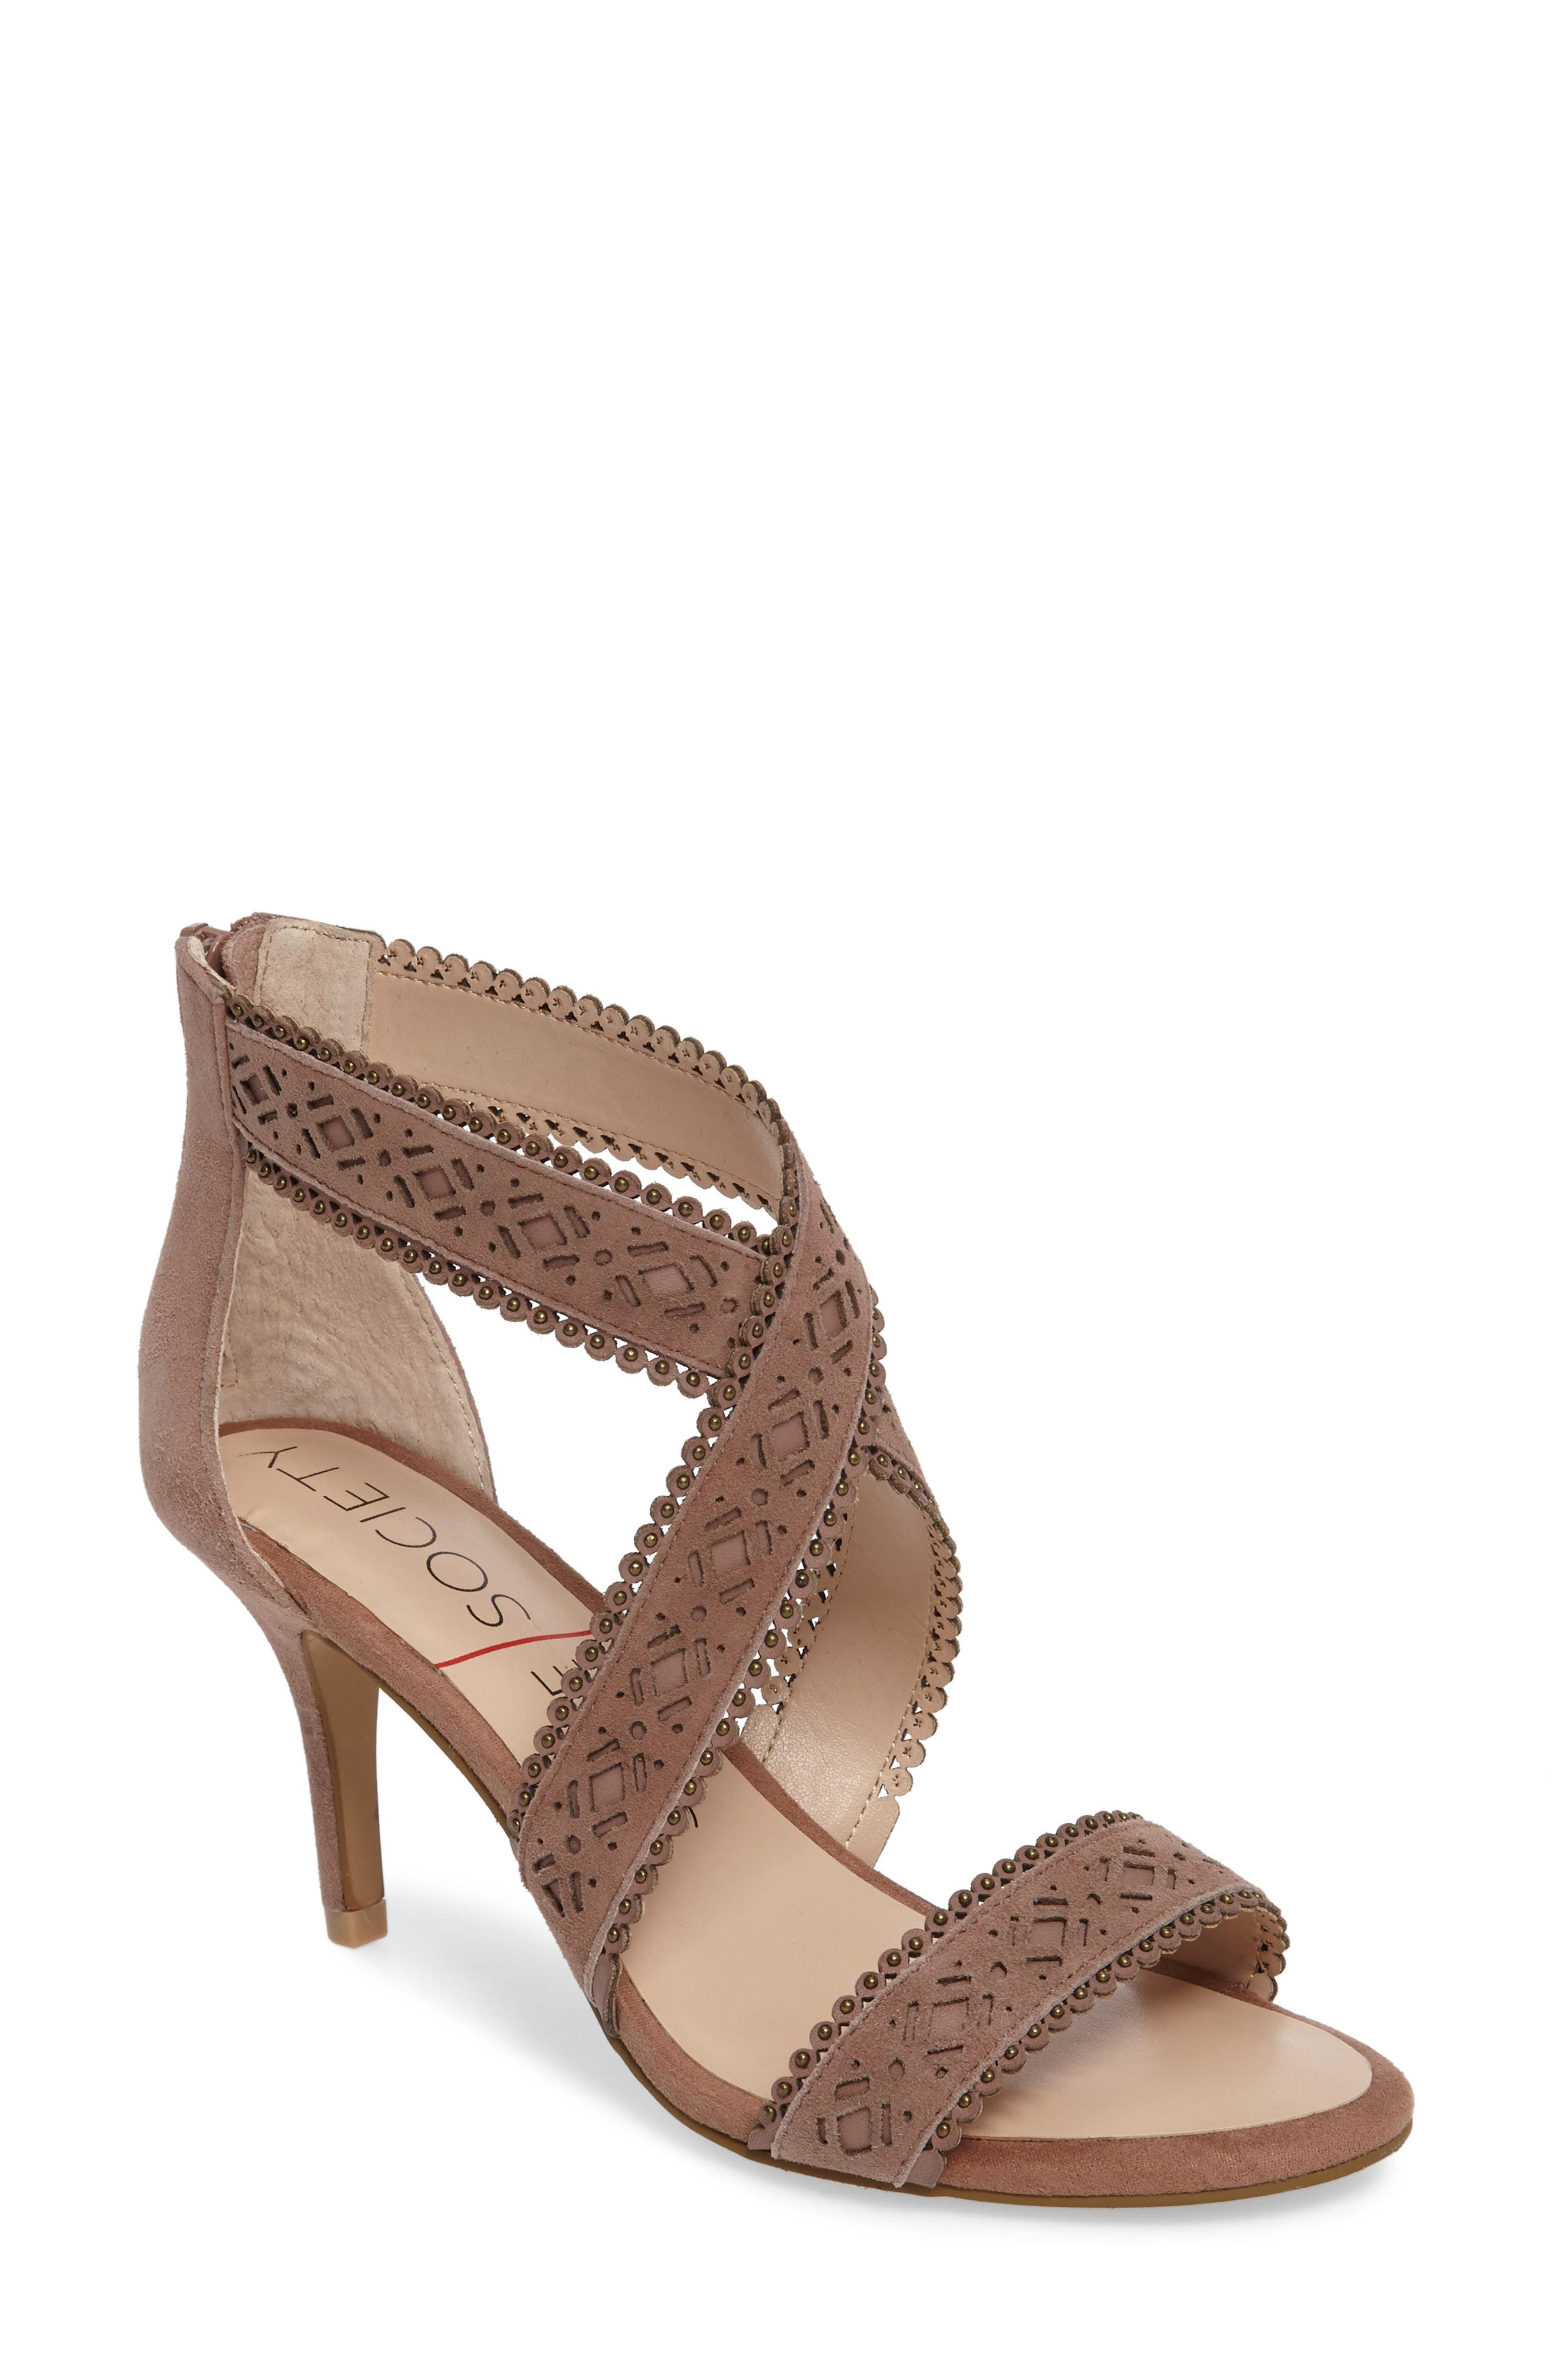 Main Image - Sole Society Sandal (Women)